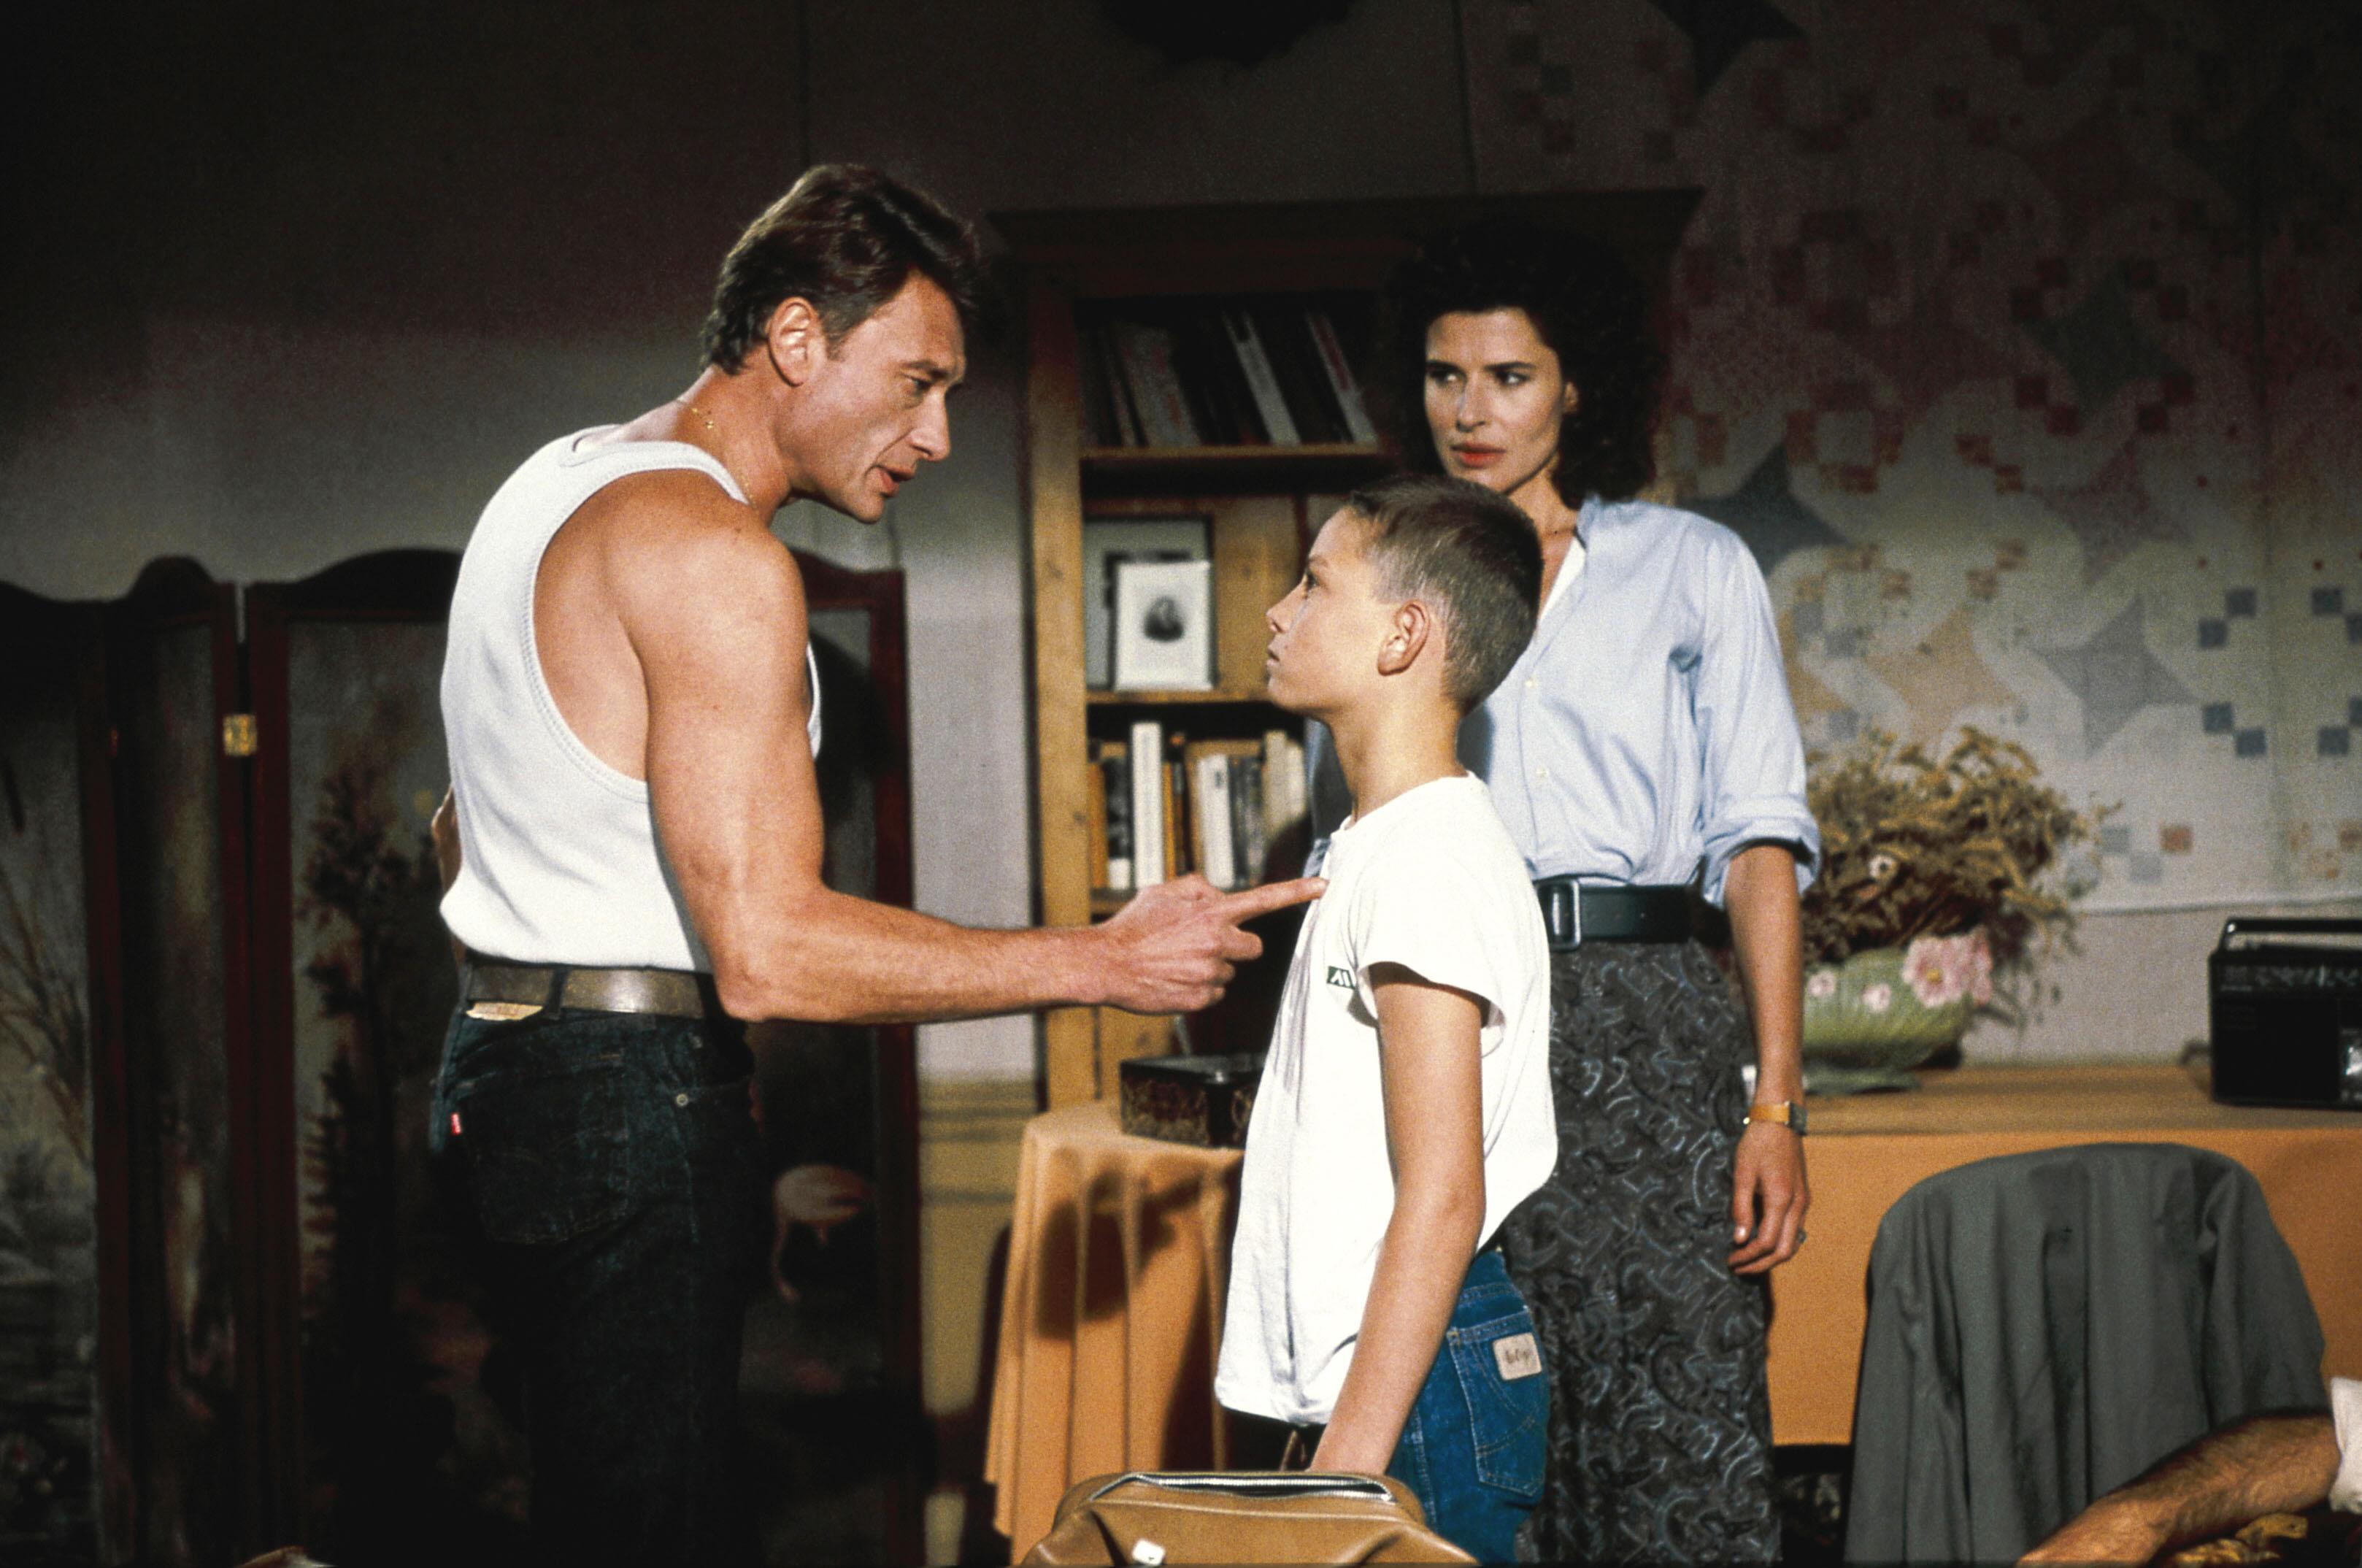 Johnny Hallyday et Fanny Ardant dans Conseil de famille de Costa-Gavras